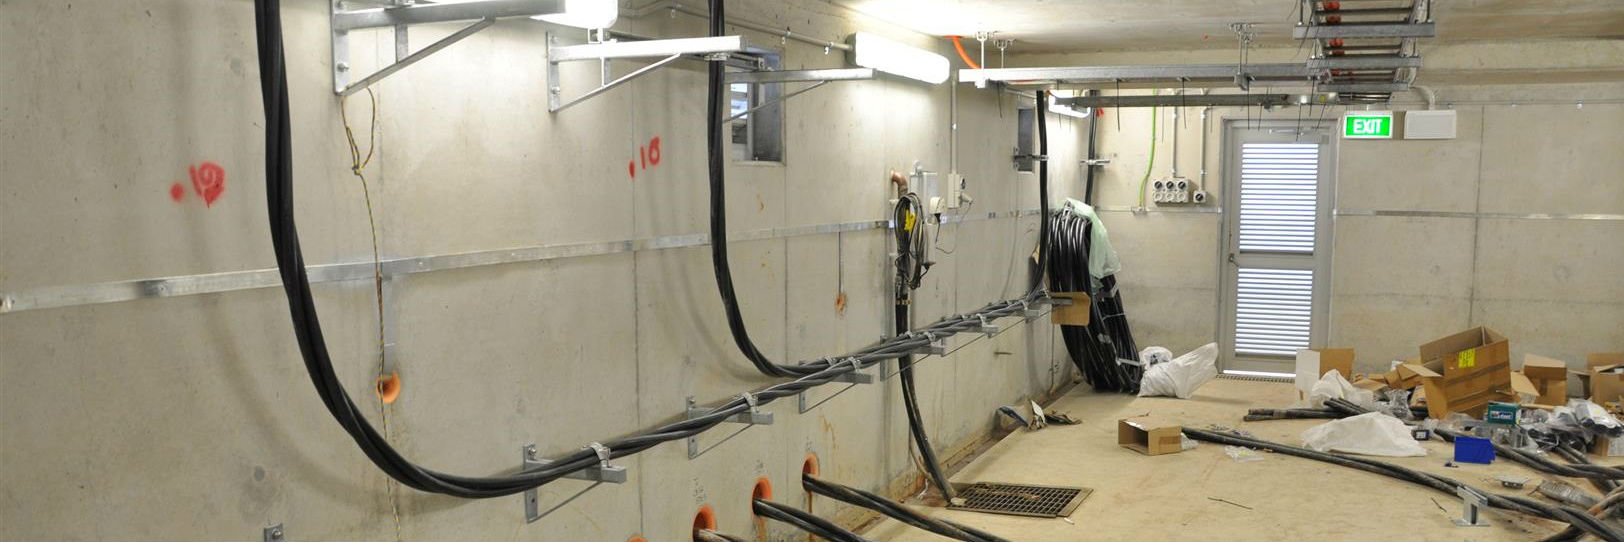 MillwellElectricalServices3